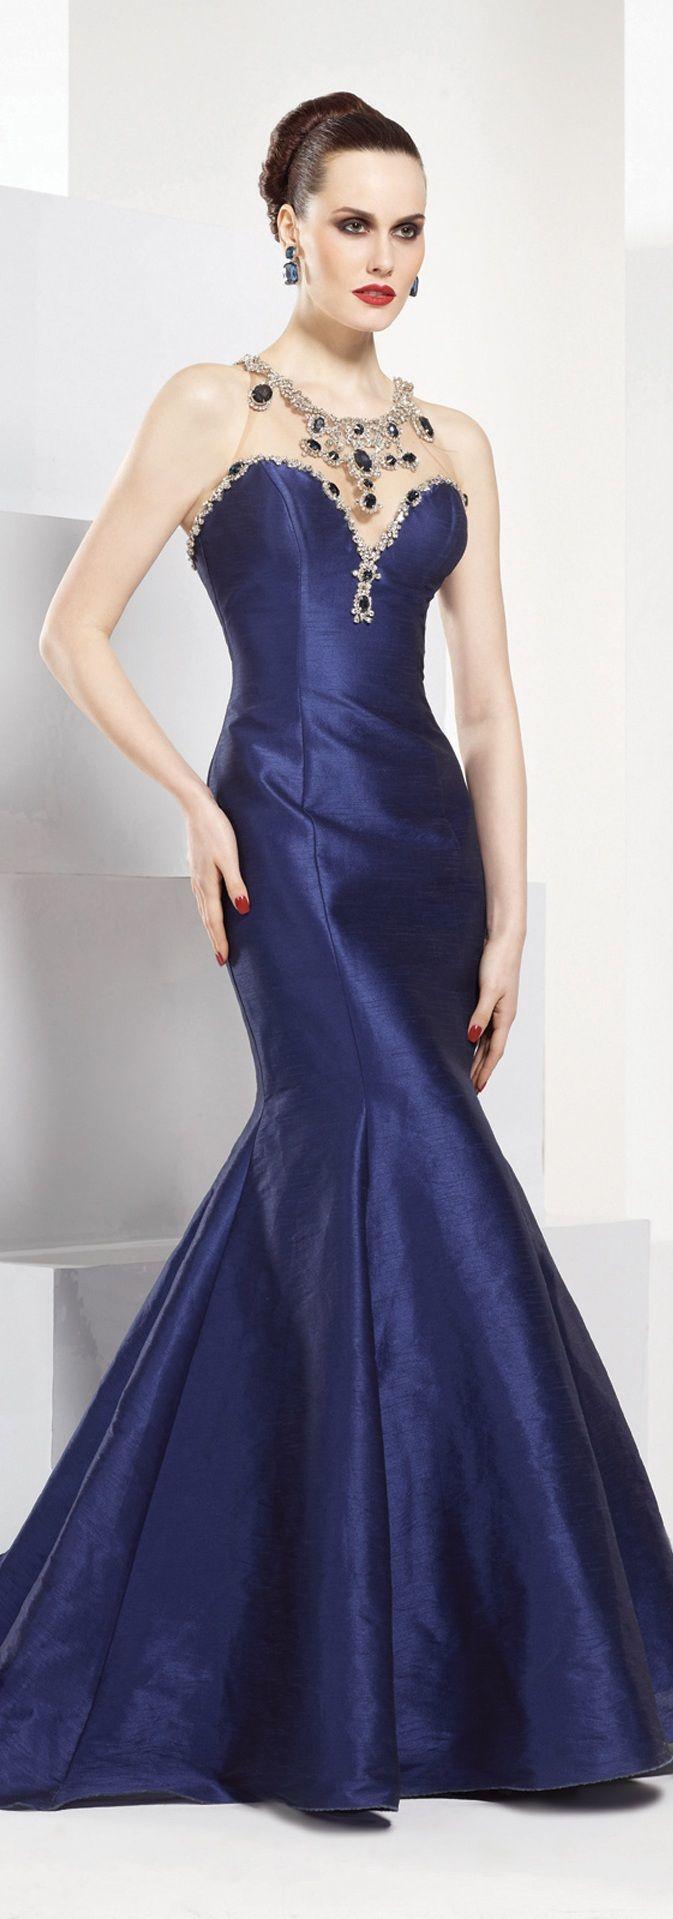 Tarik Ediz couture ~   all perfect!